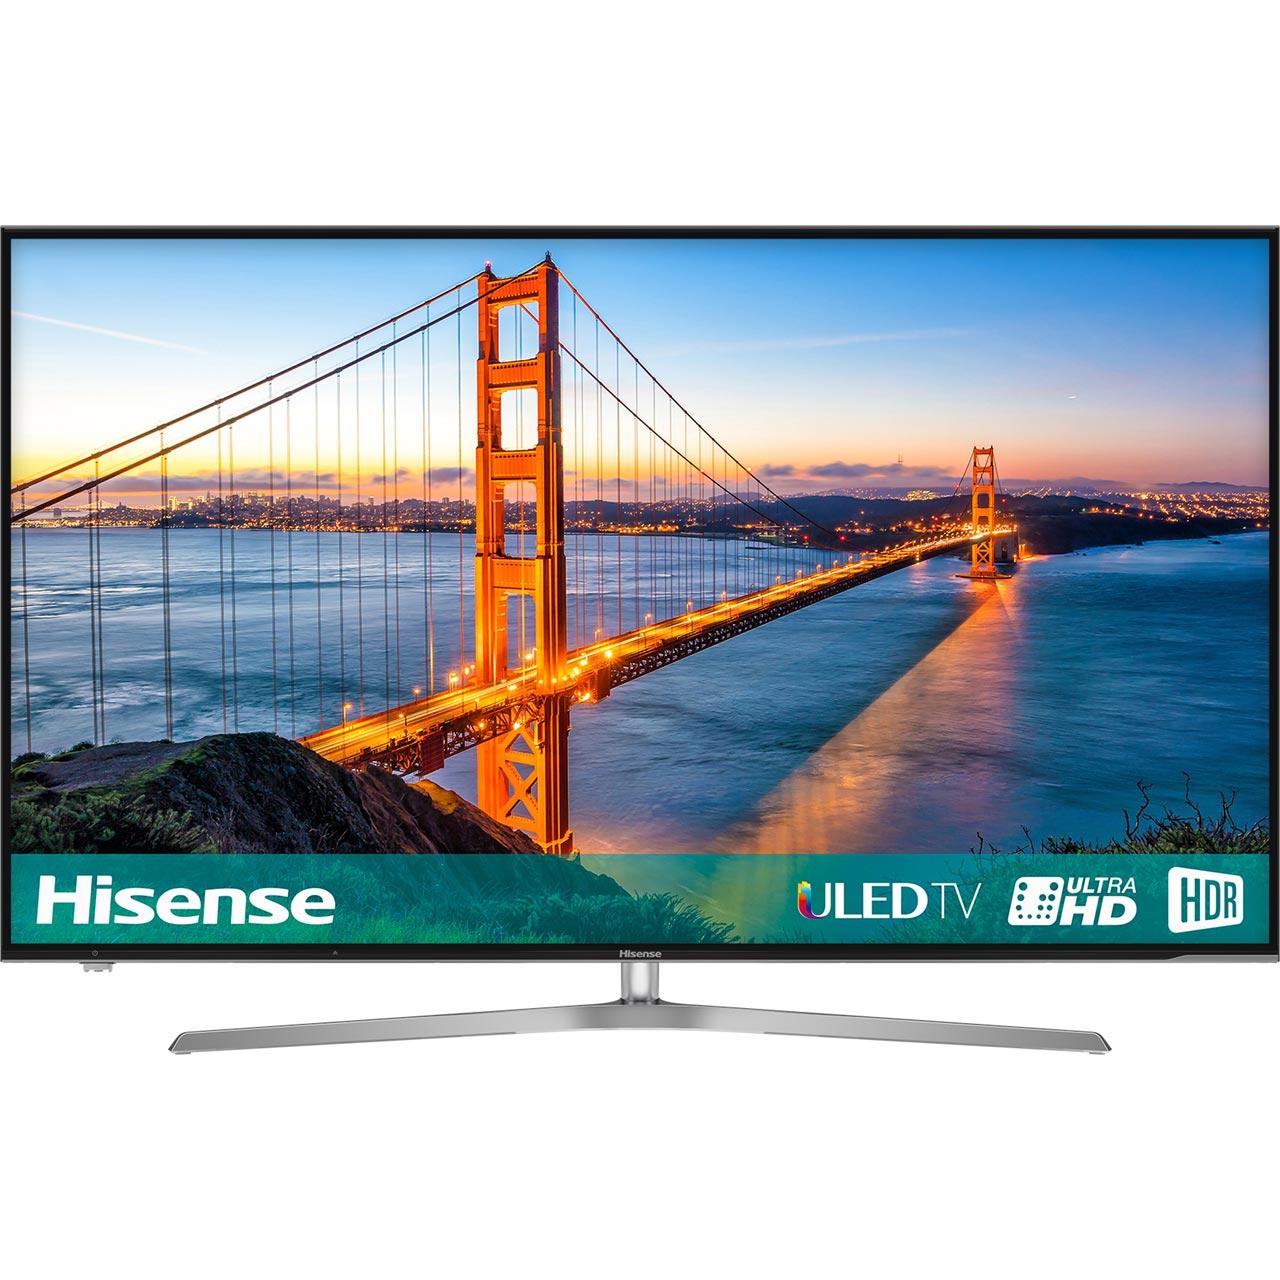 "Hisense H55U7AUK 55"" Smart 4K Ultra HD TV HDR10 and Freeview Play + FREE Google Home mini with code £499 @ AO"